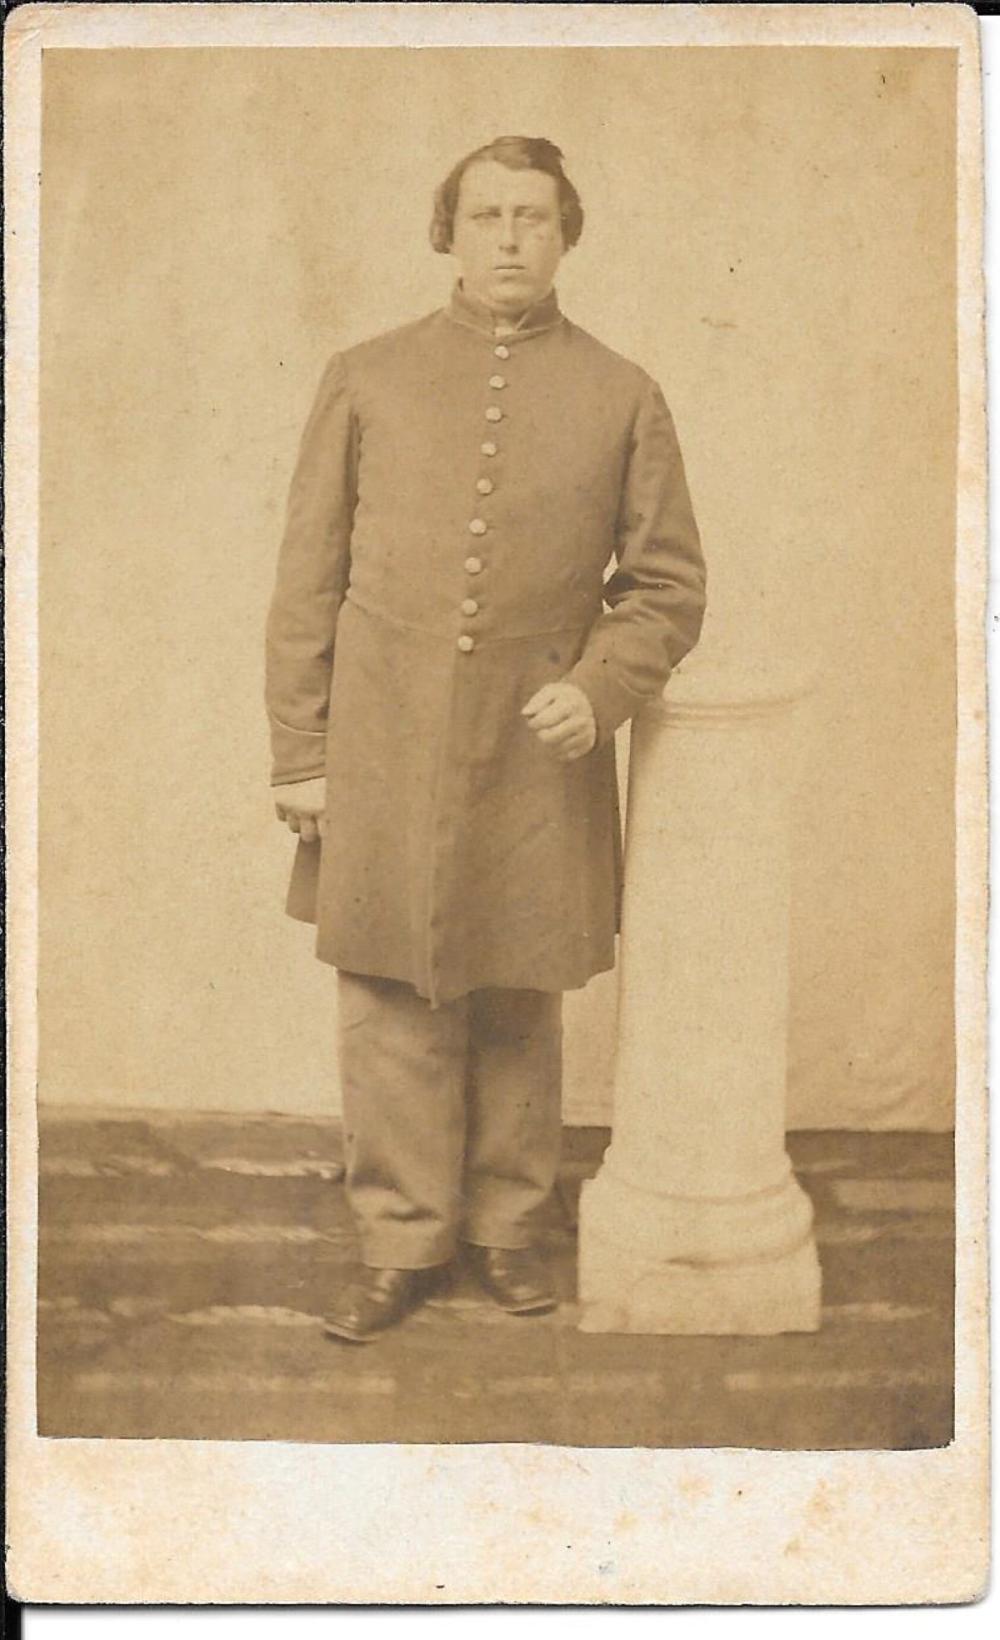 CDV, Civil War soldier Joseph Pike